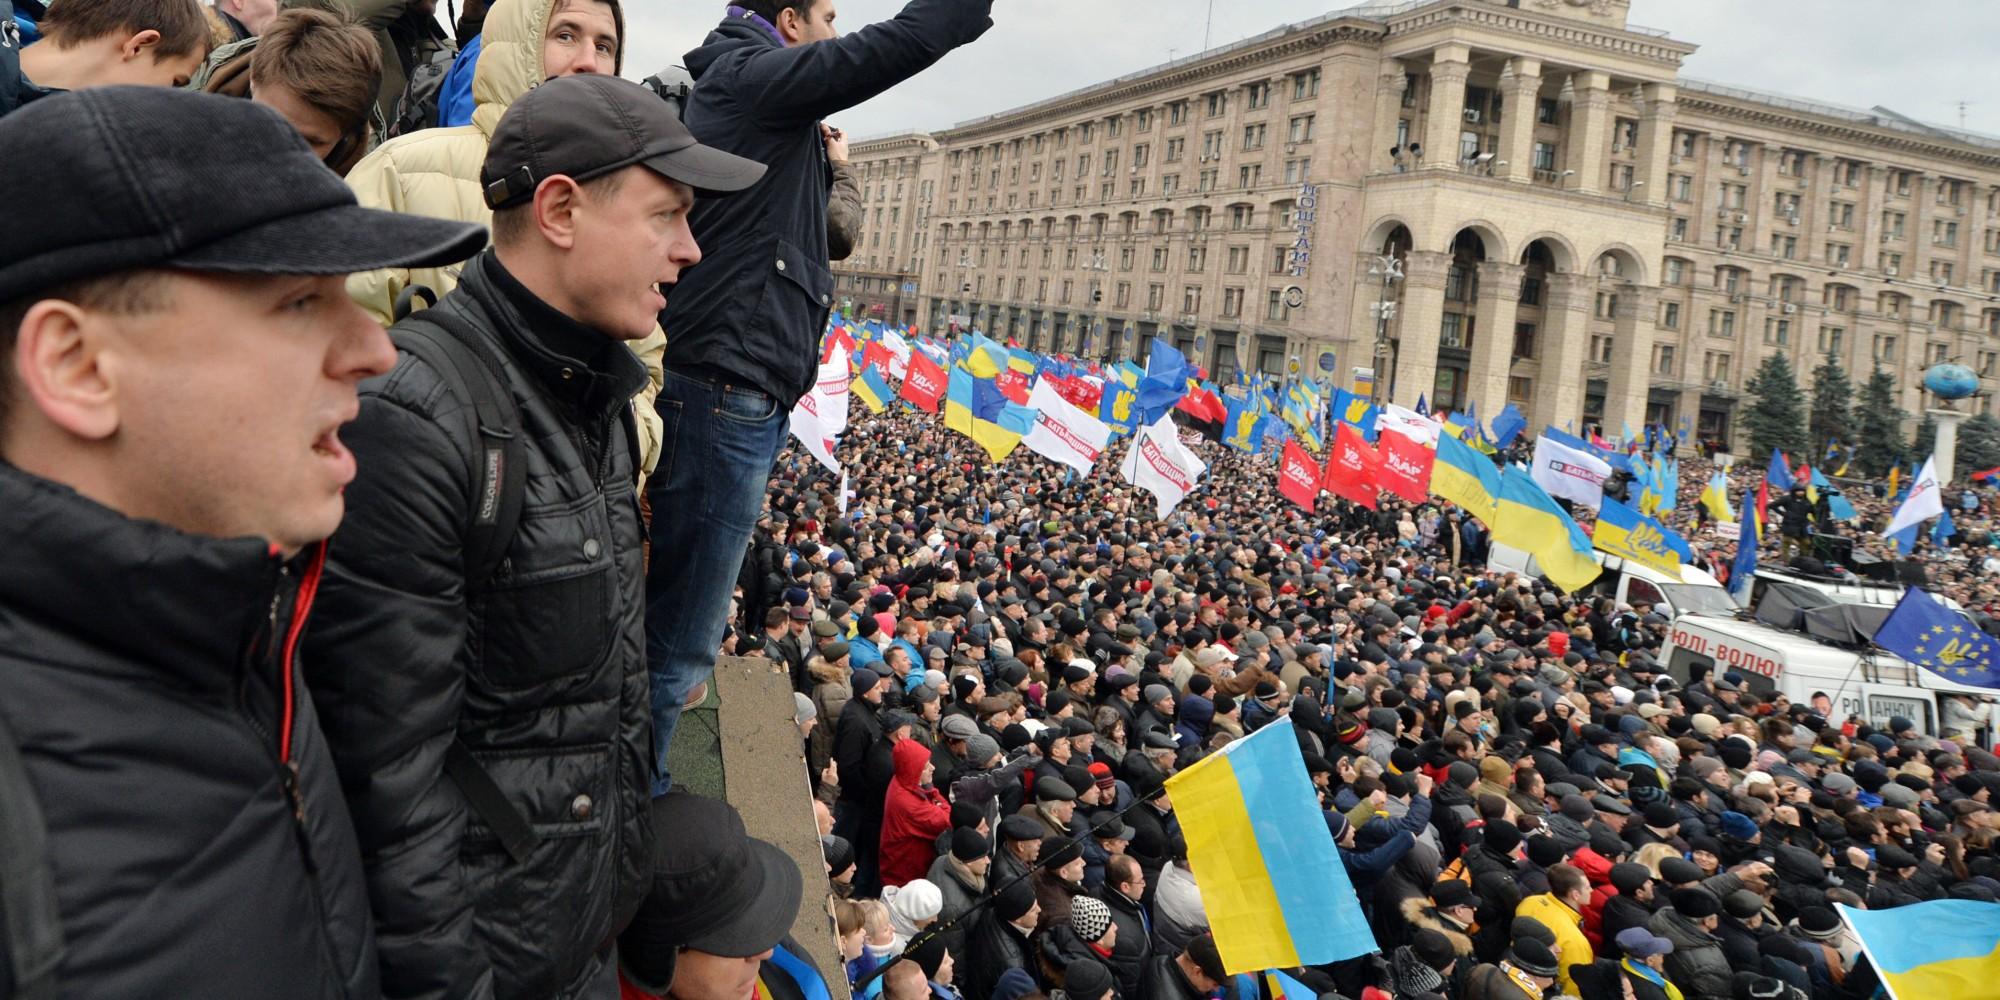 ВКиеве наМайдане установили большую армейскую палатку